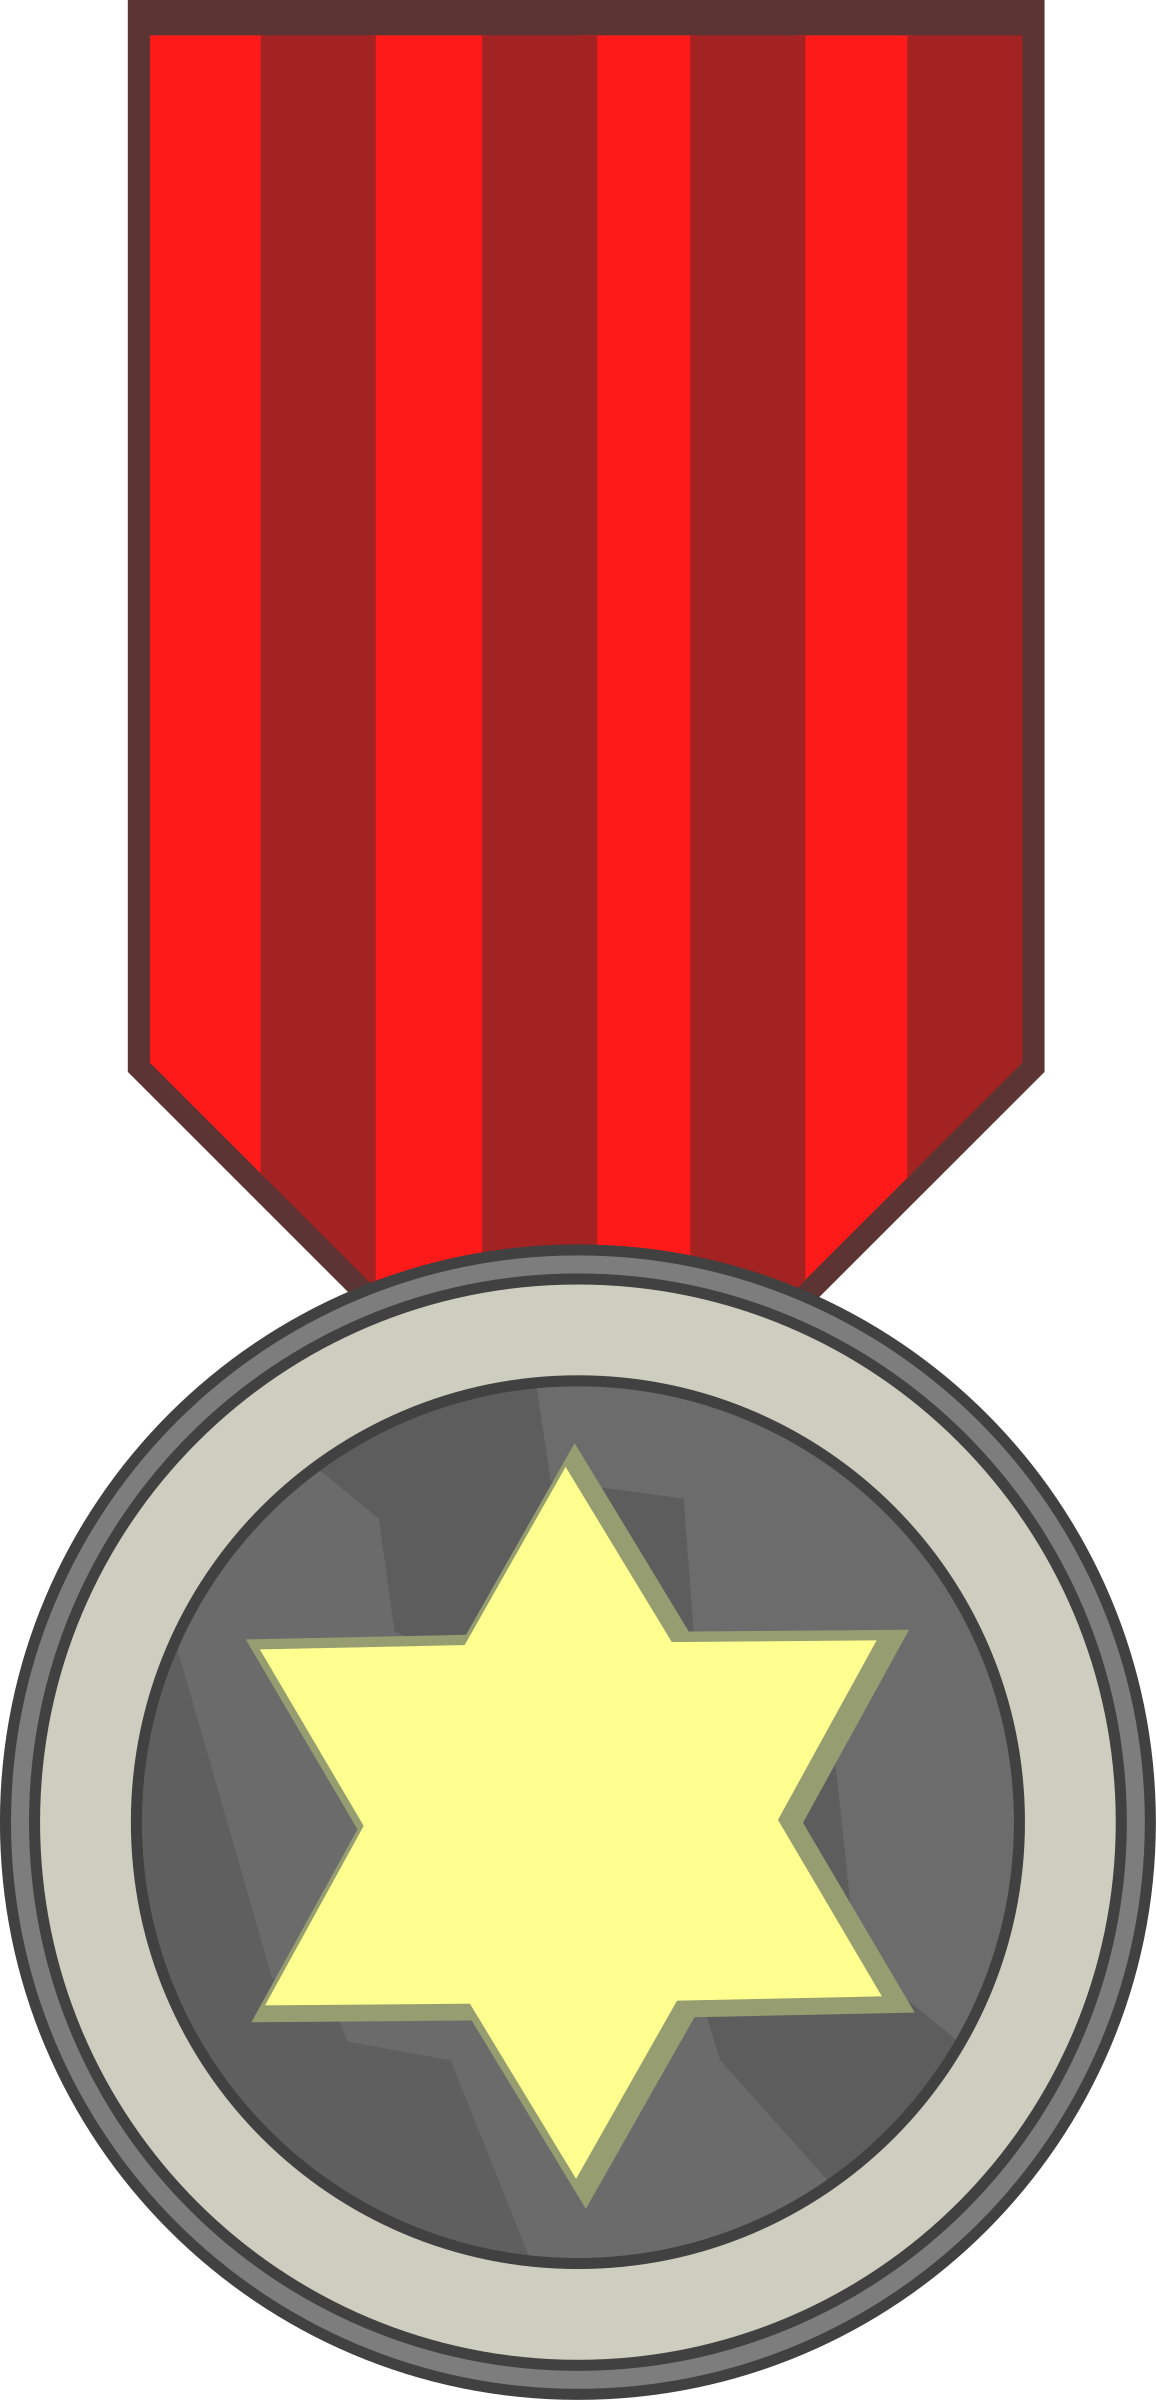 Award clipart medal. Star big image png